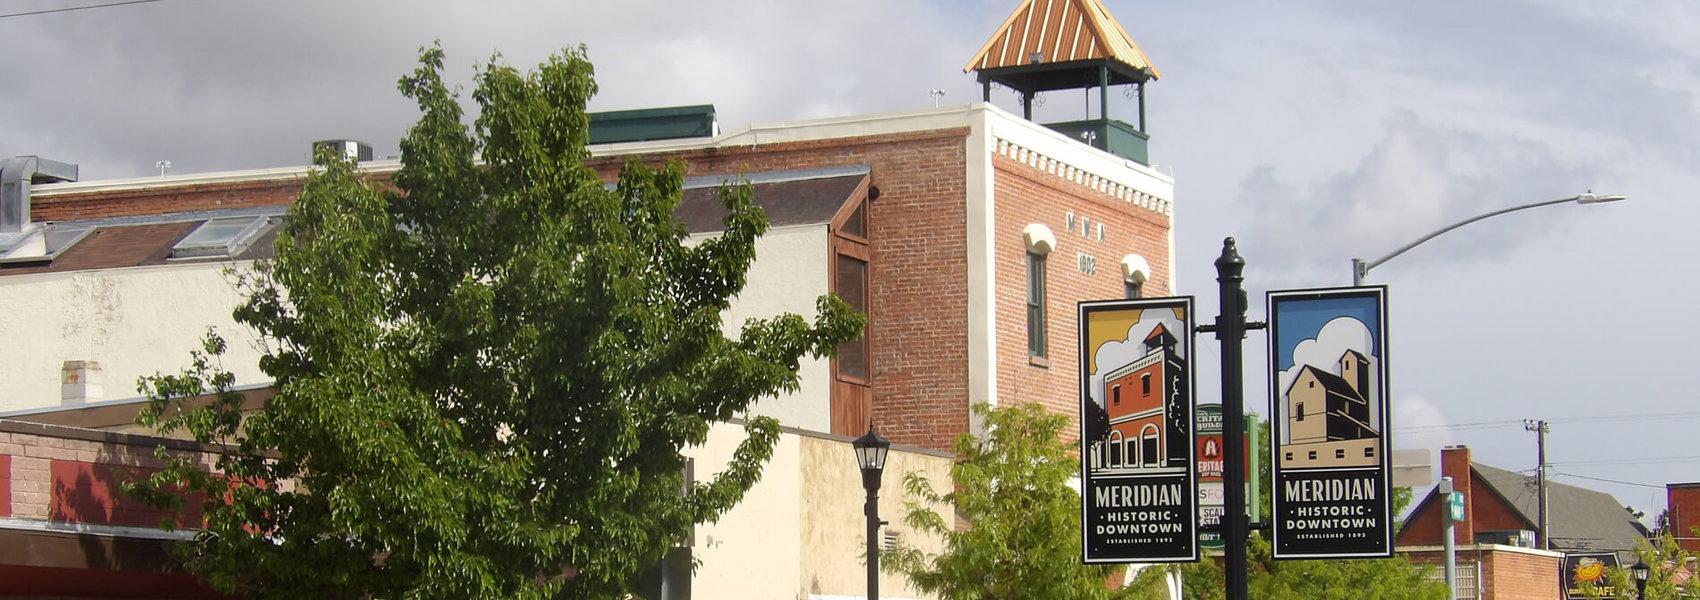 homes and listings in meridian